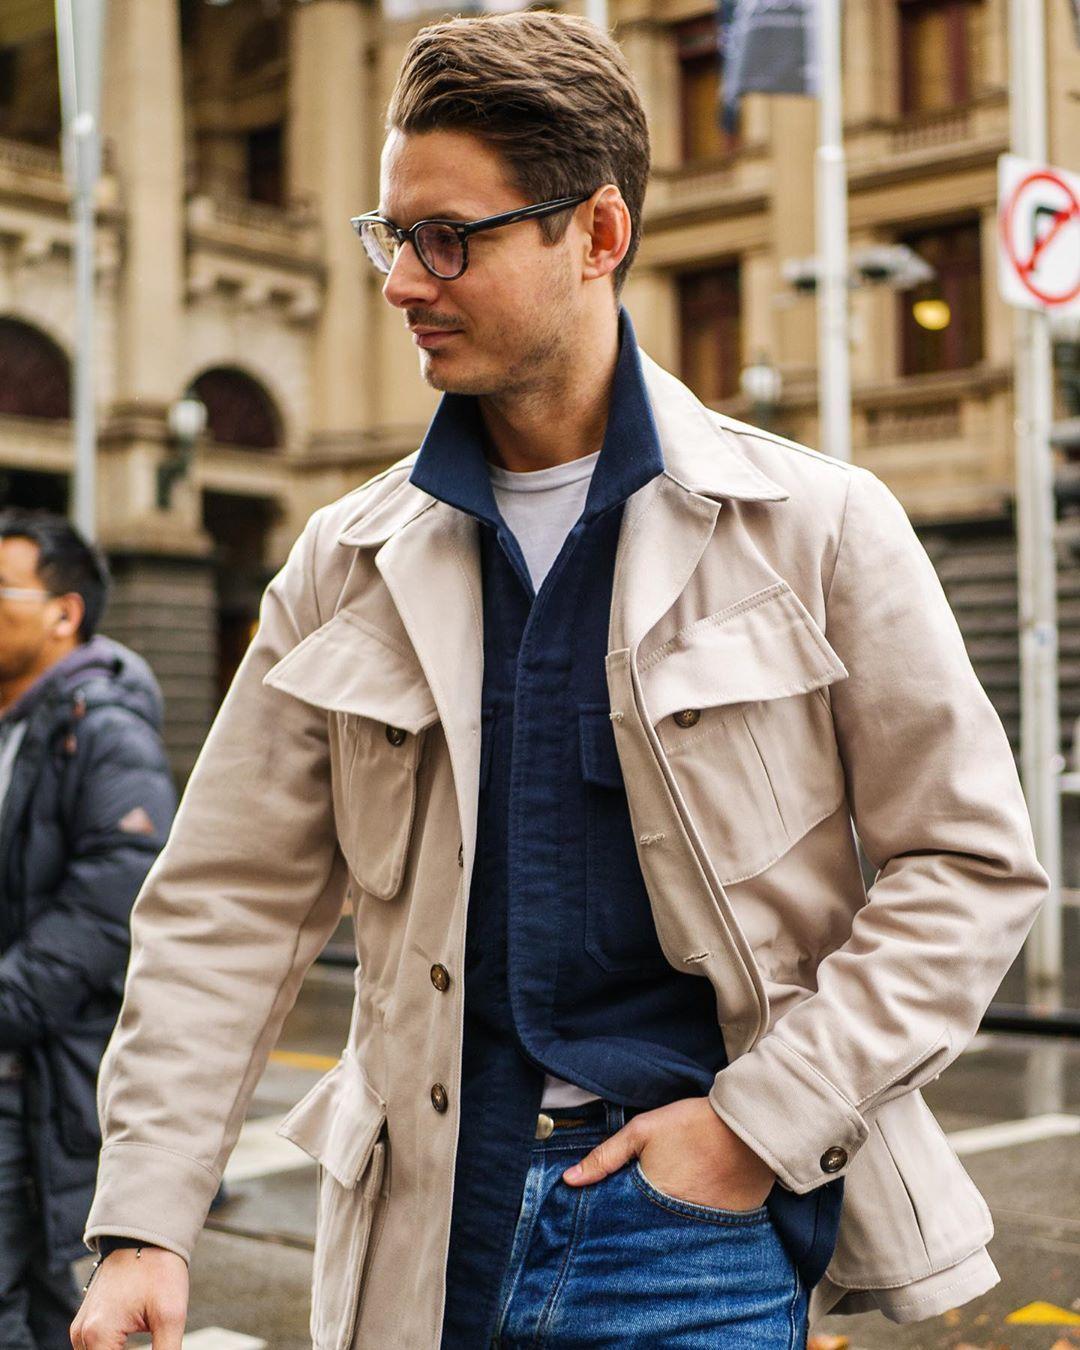 Sartorial Casualwear On Instagram Contrasting Layers Sartorial Casual Wear Safari Jacket [ 1350 x 1080 Pixel ]